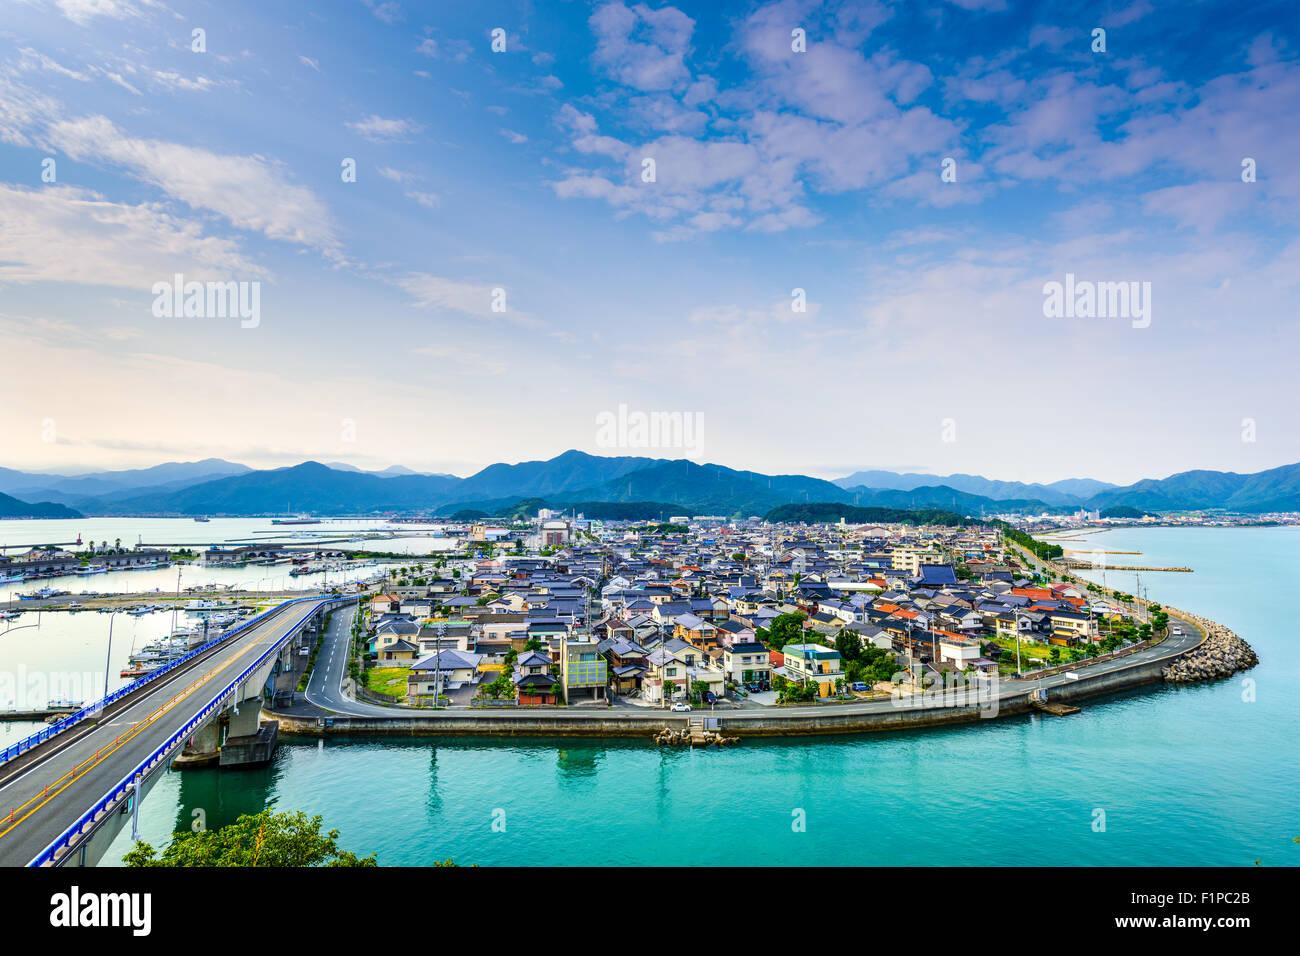 Senzaki, Nagato, Blick auf die Stadt Yamaguchi Japan. Stockbild